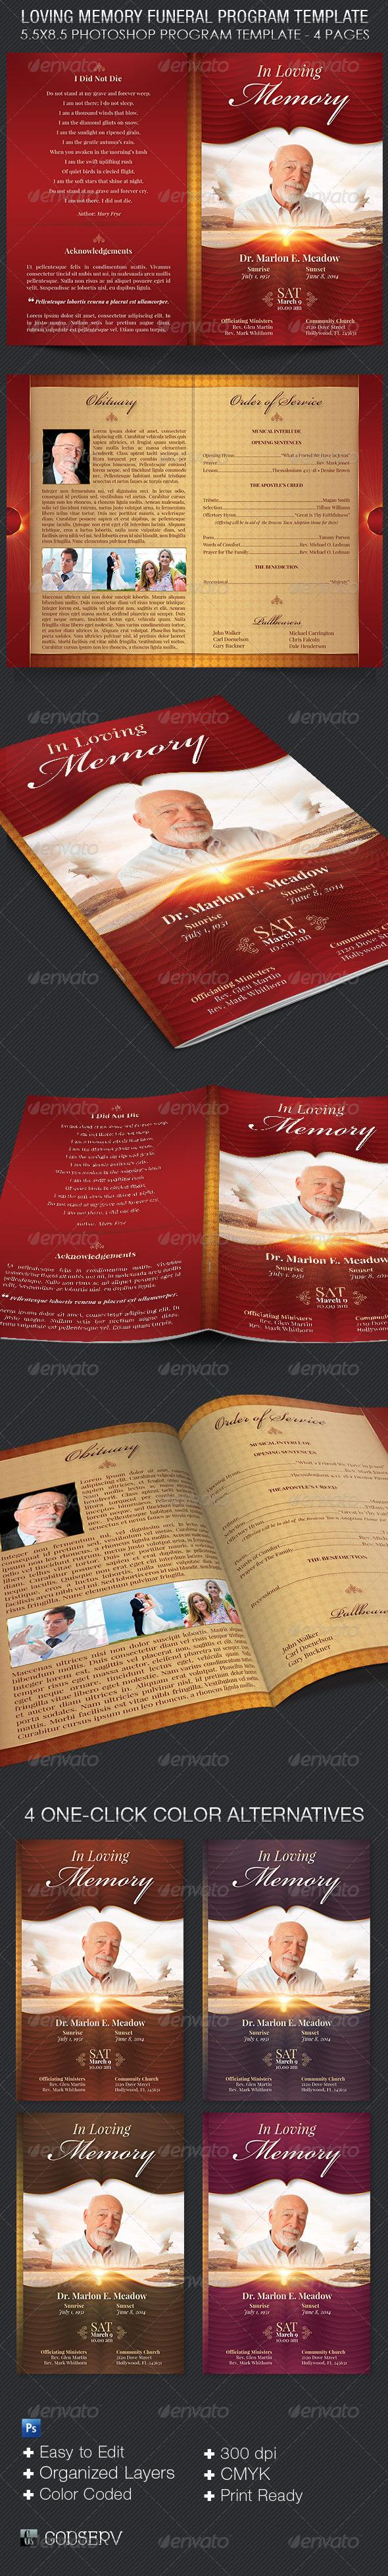 Loving Memory Funeral Program Template